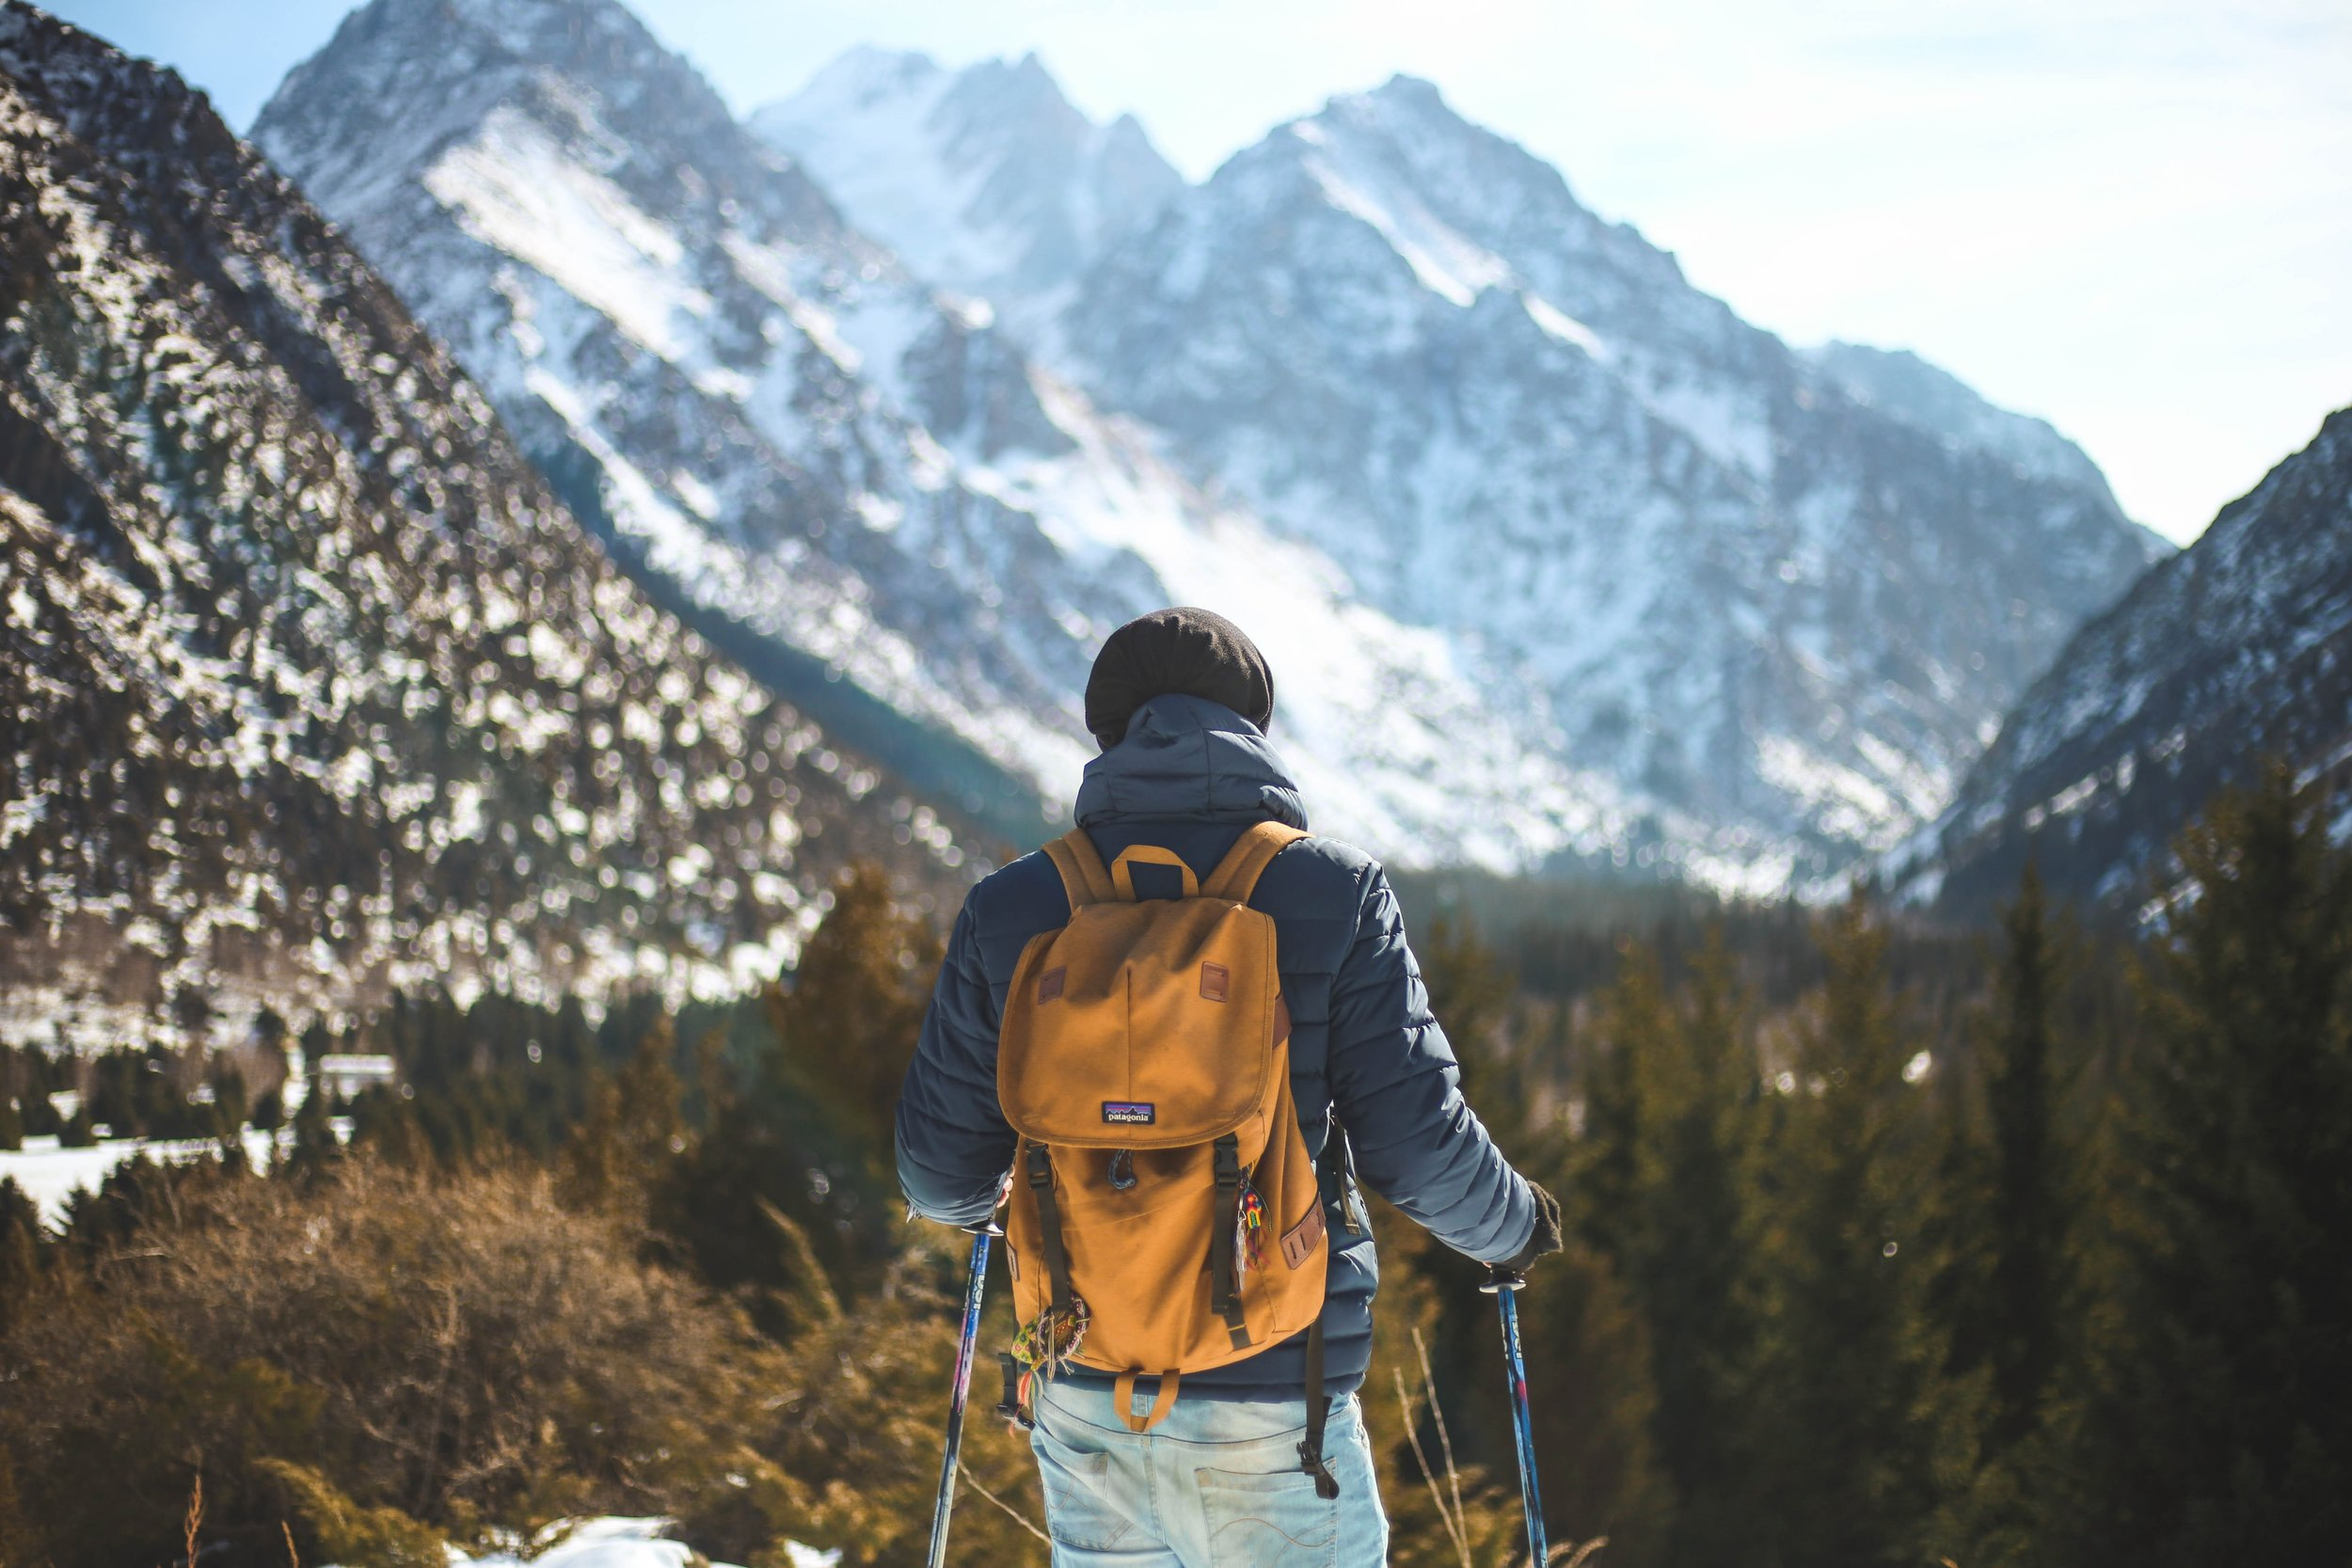 adventure-backpack-climb-868097.jpg